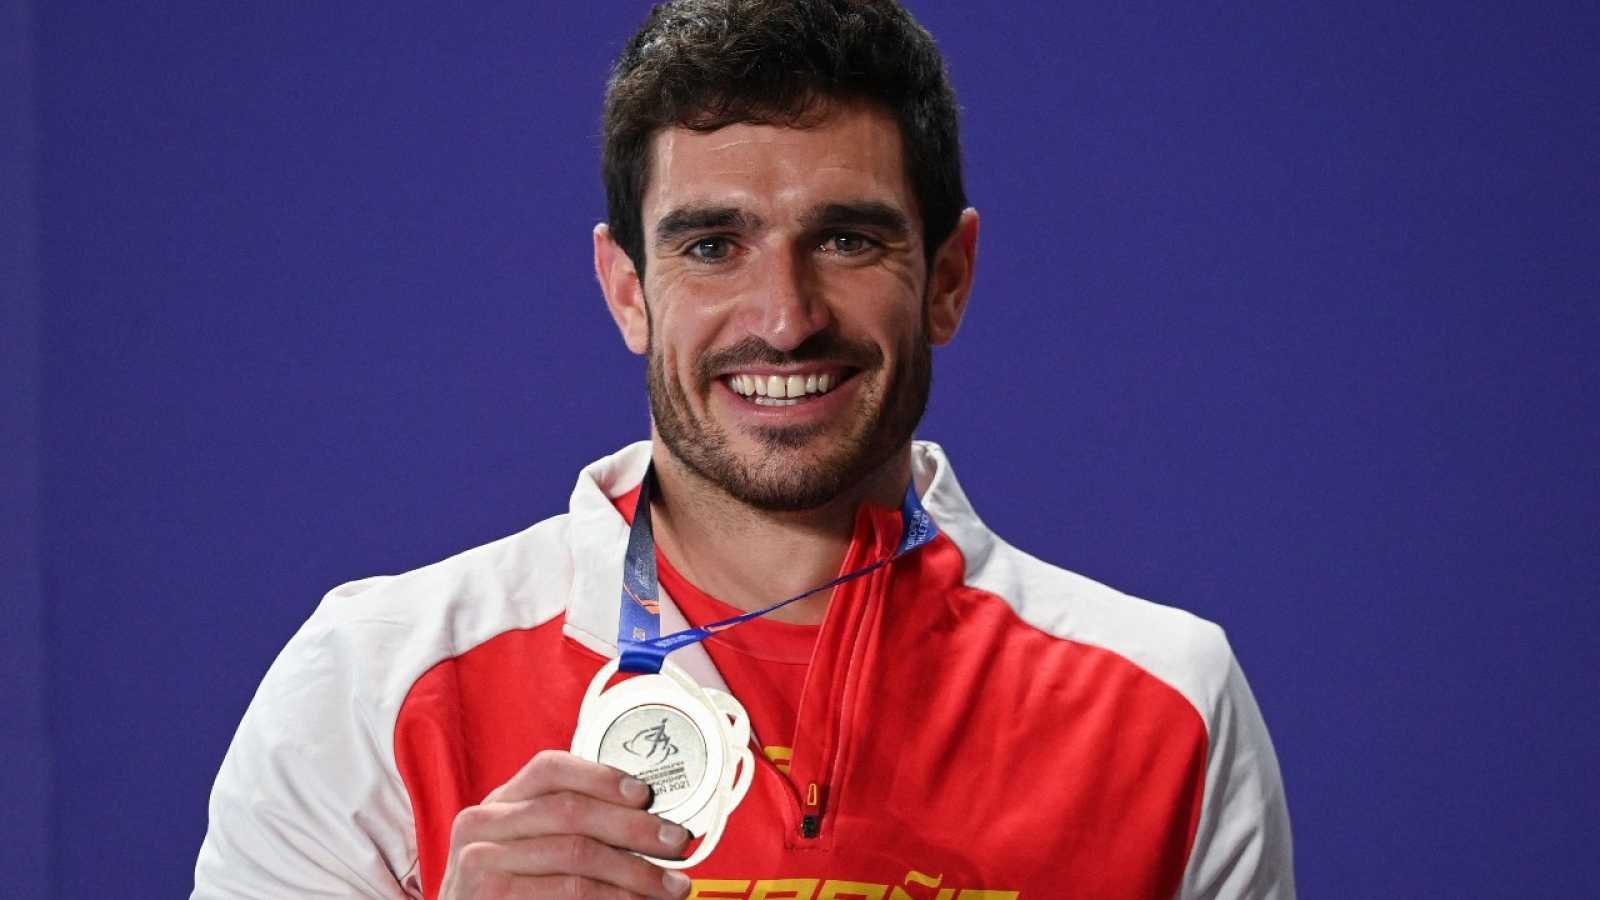 Jorge Ureña, plata en el heptatlón de Torun 2021